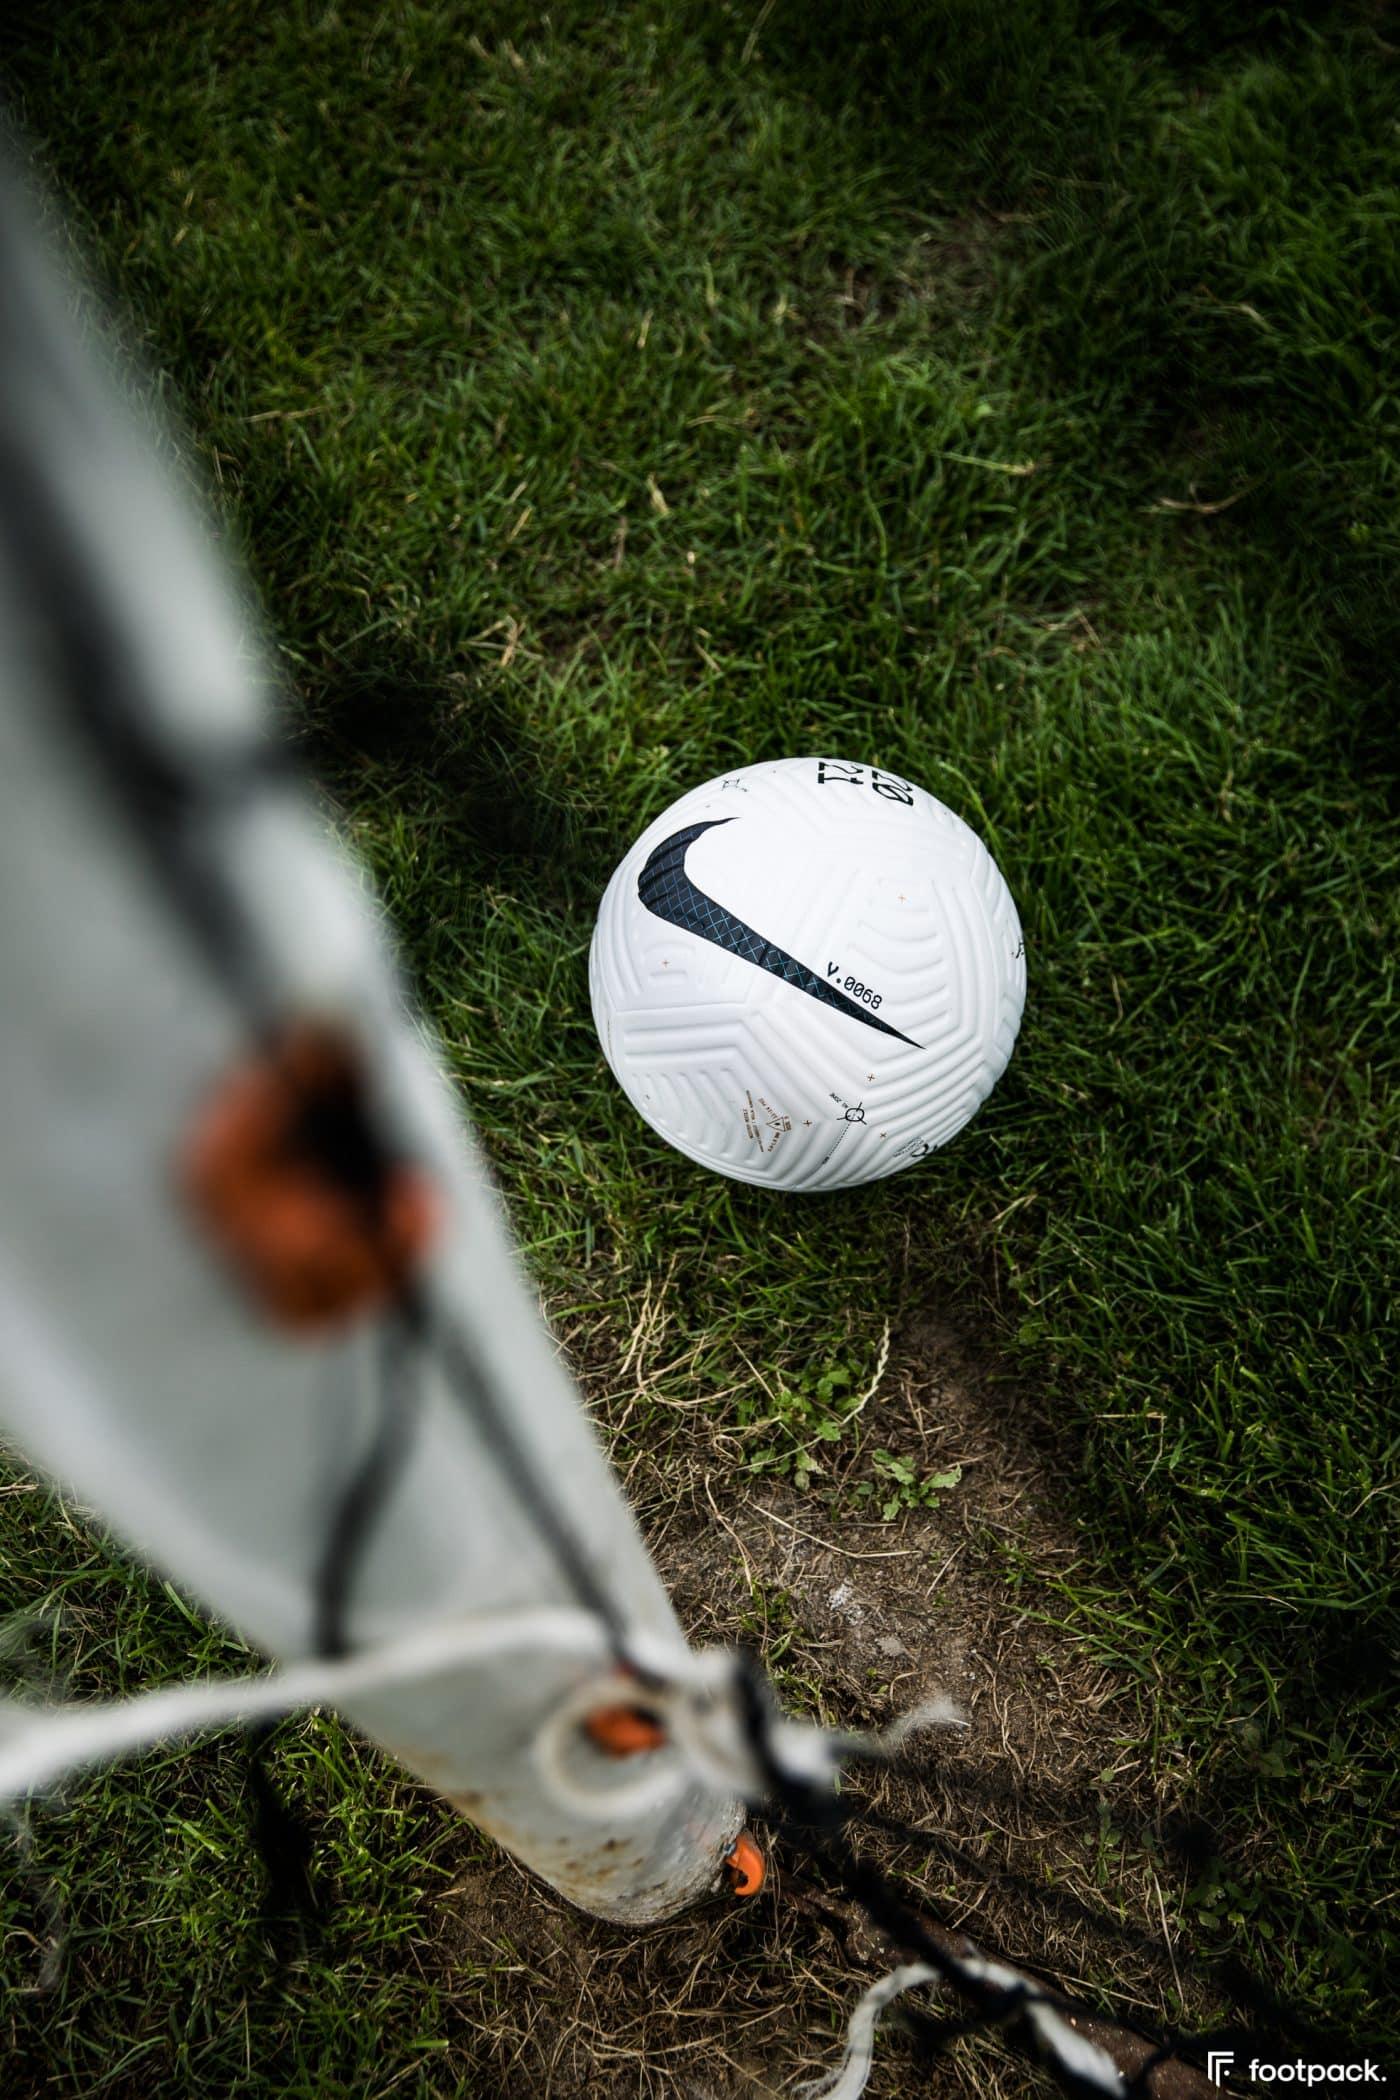 ballon-nike-flight-premier-league-serie-a-footpack-28